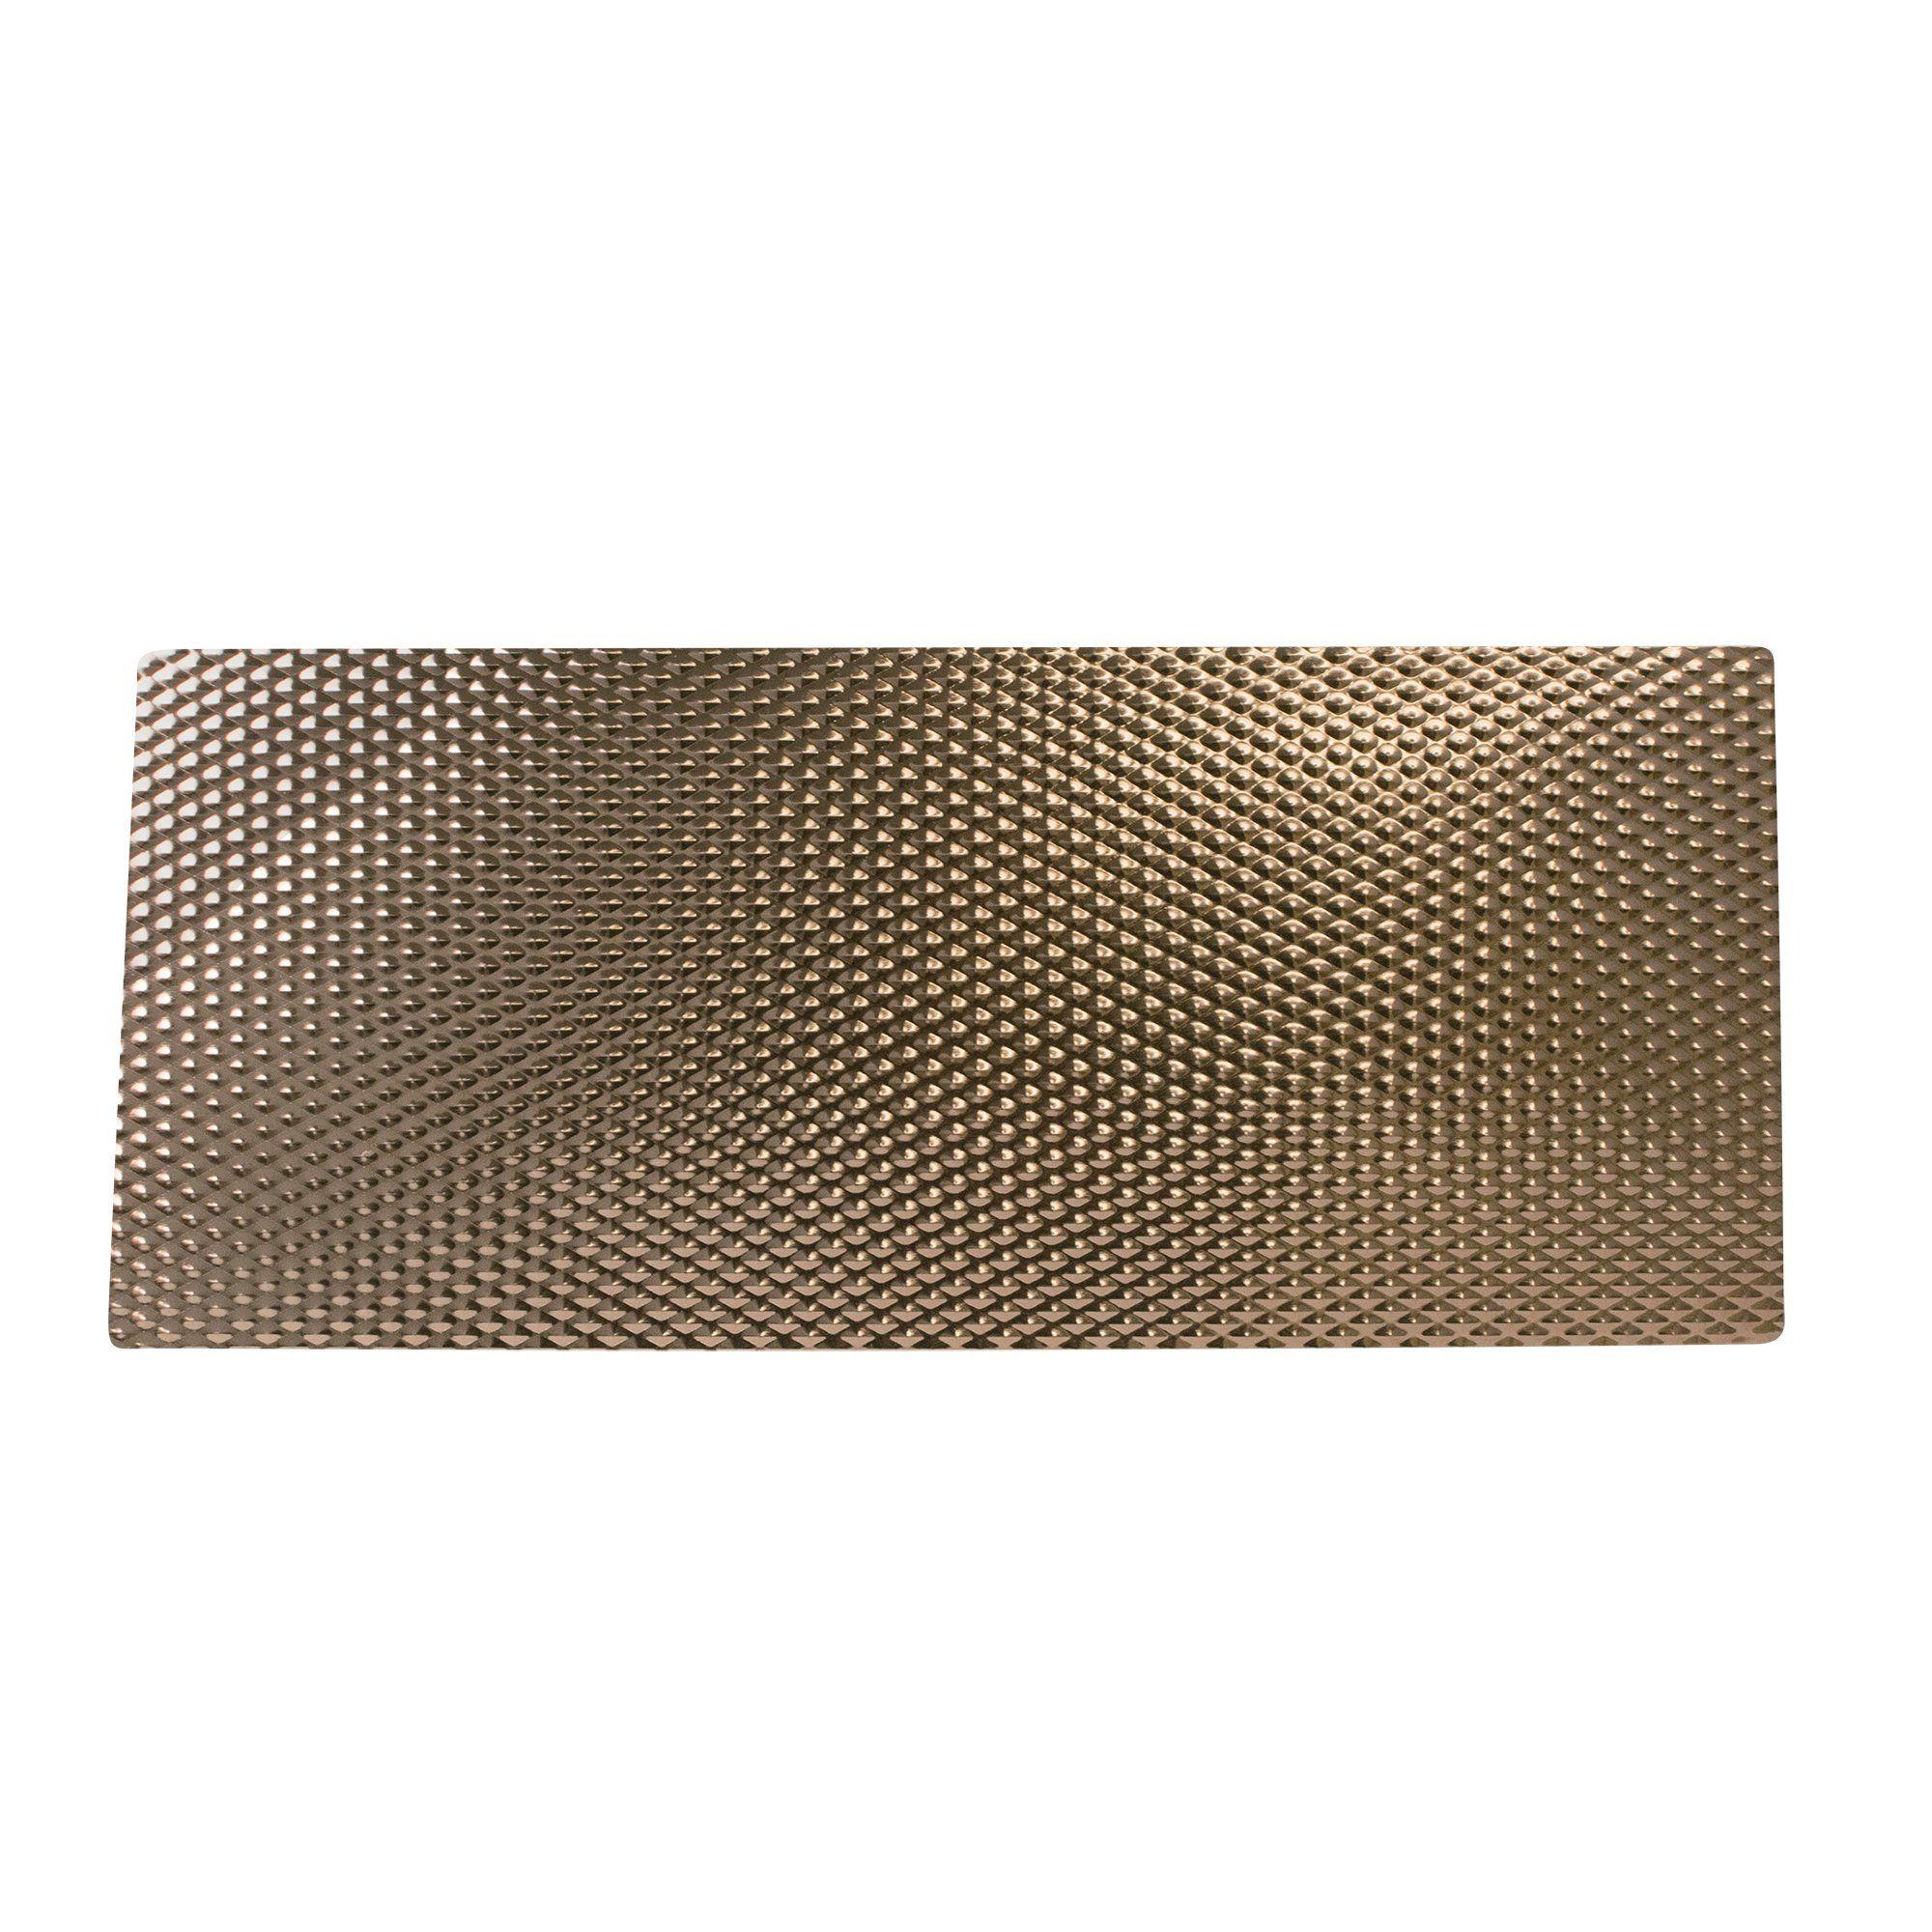 Insulated Countertop Protector Mats Hot Pads Countertops Quartz Or Granite